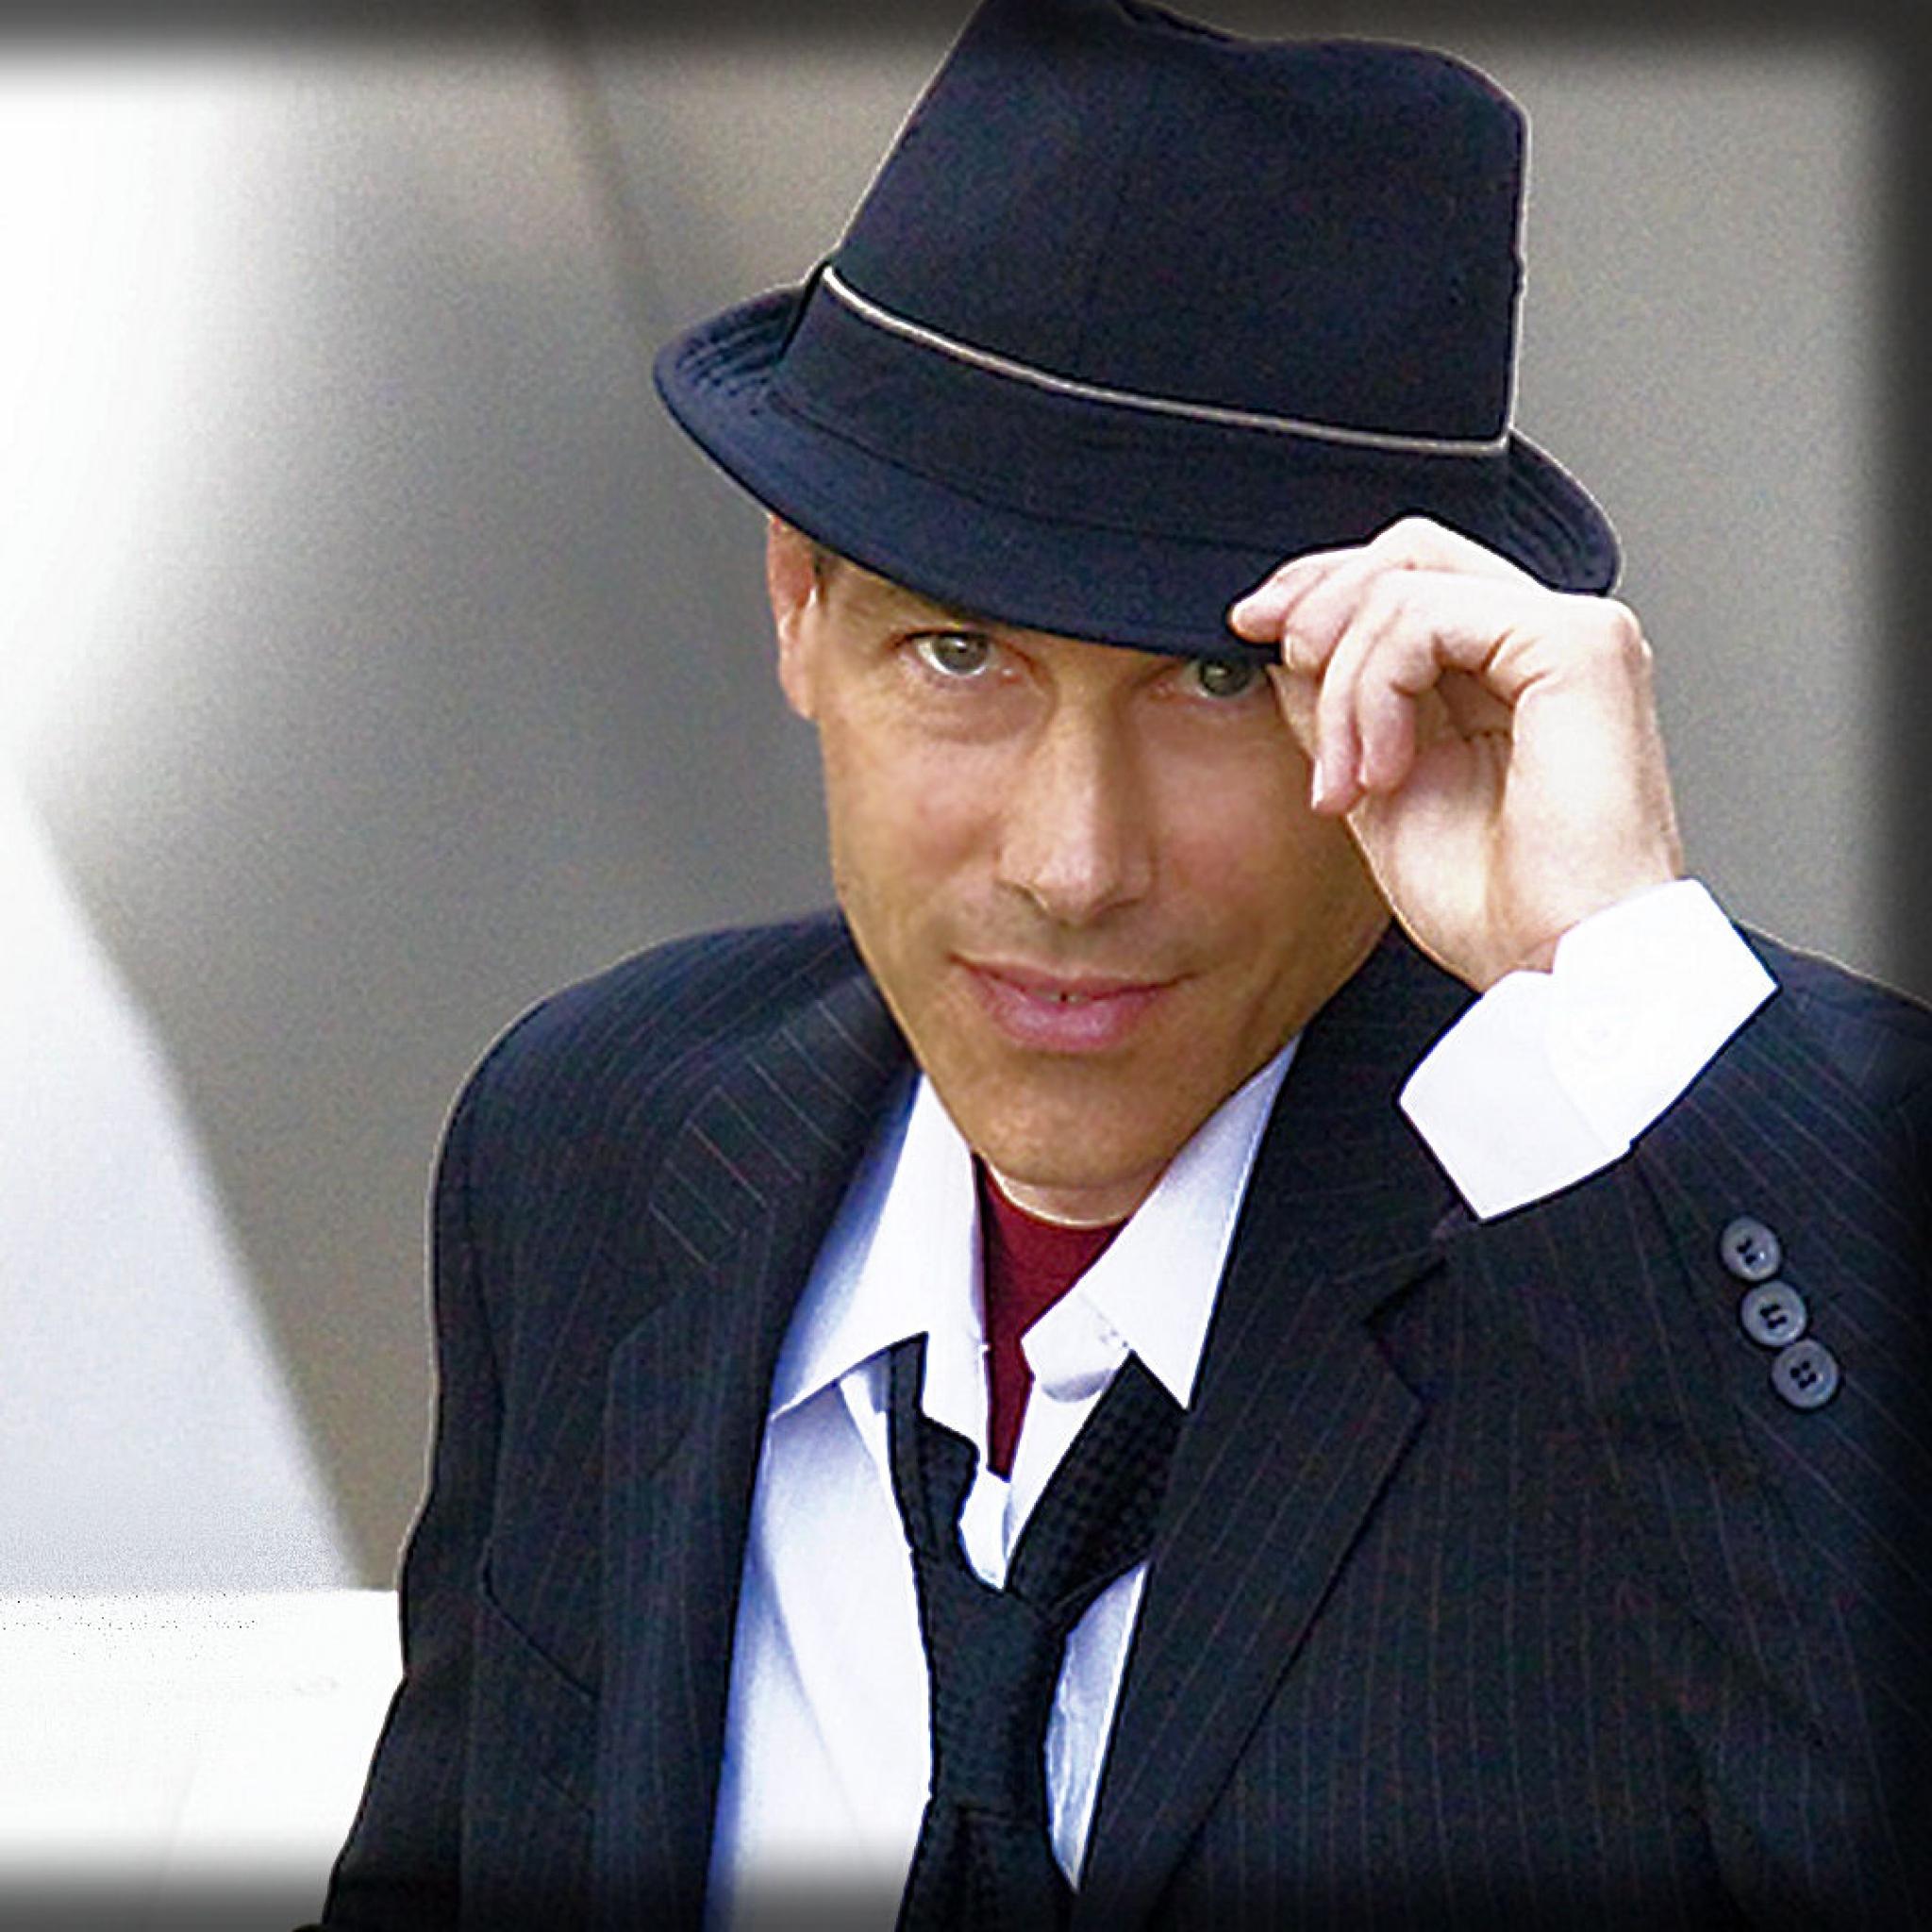 gregg_karukas_hat_suit_tie_shirt_7575_2048x2048.jpg